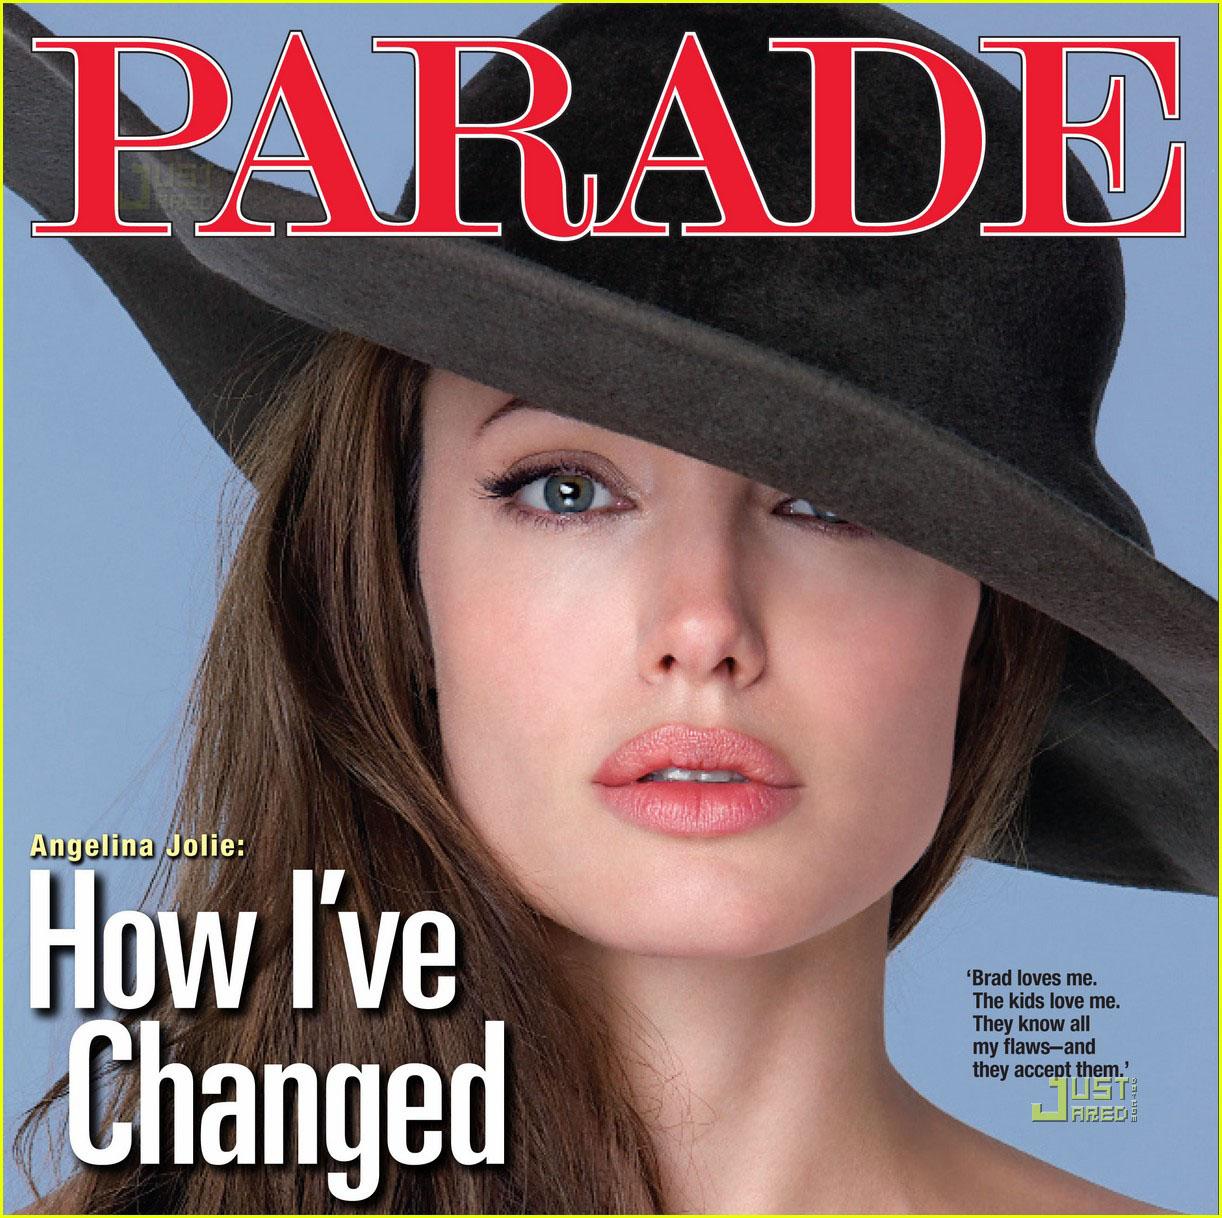 http://2.bp.blogspot.com/_sBBi-c1S7gU/TDTBC5-MmMI/AAAAAAAAM2w/qqCqoEpc7oA/s1600/angelina-jolie-parade-magazine-cover-01.jpg